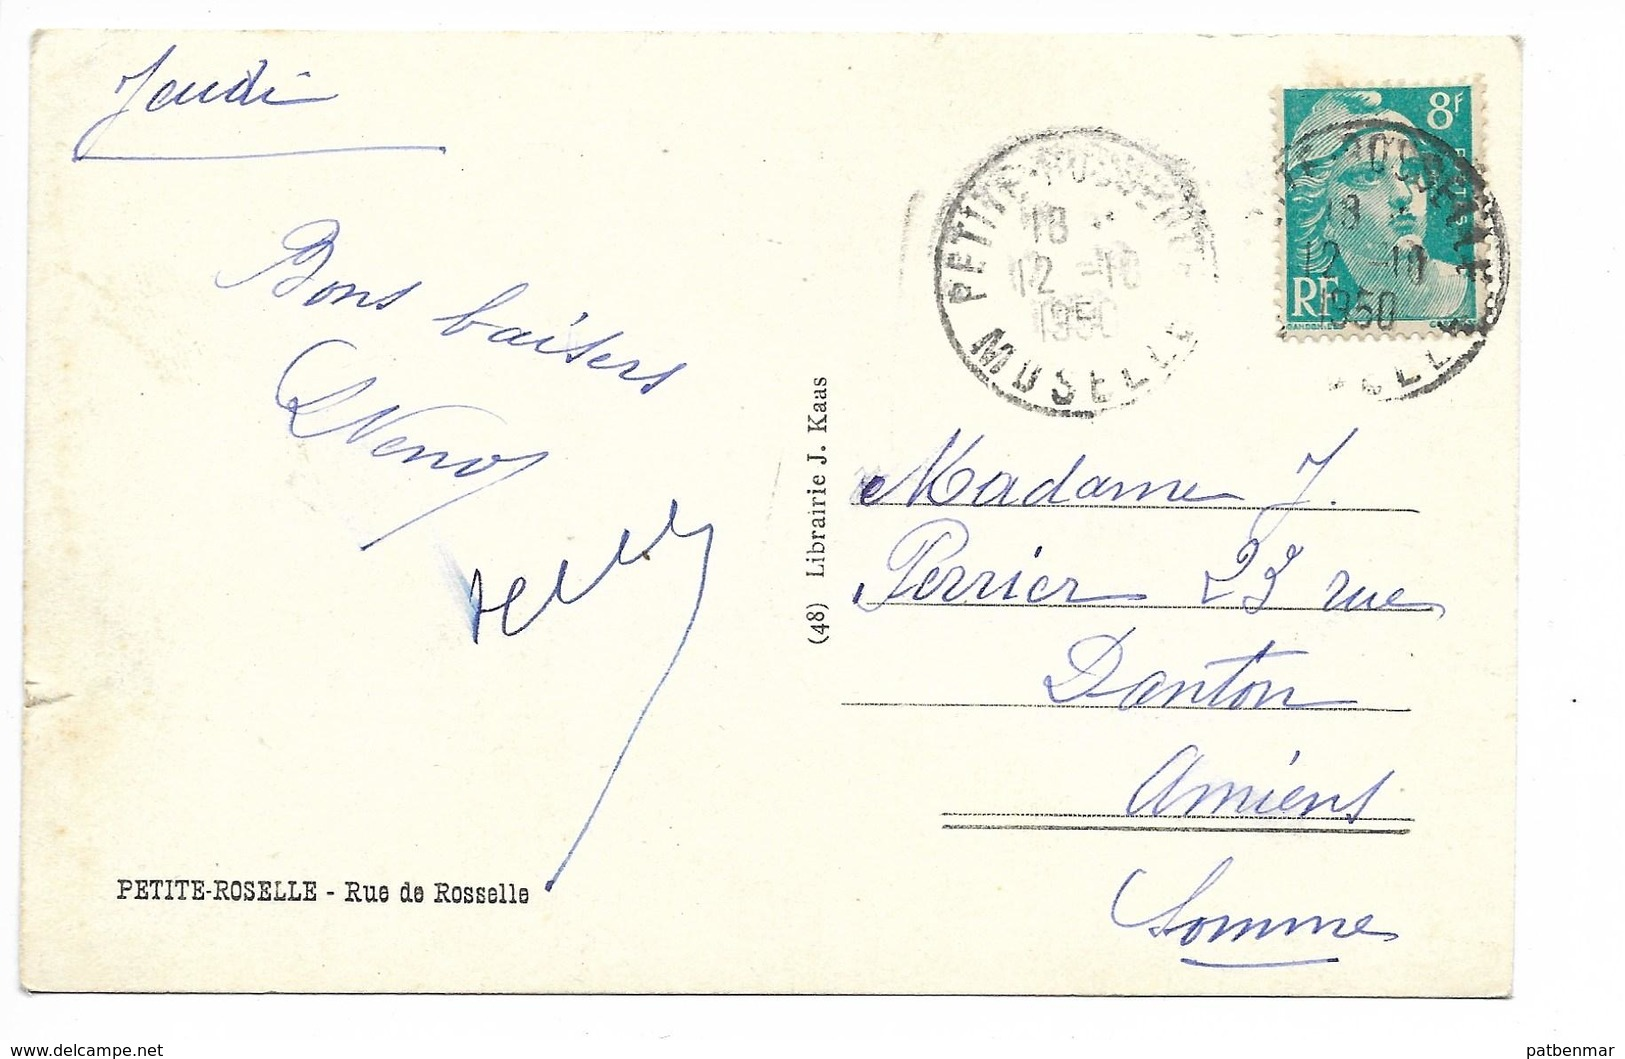 PETITE ROSELLE RUE DE ROSSELLE 1950 - France